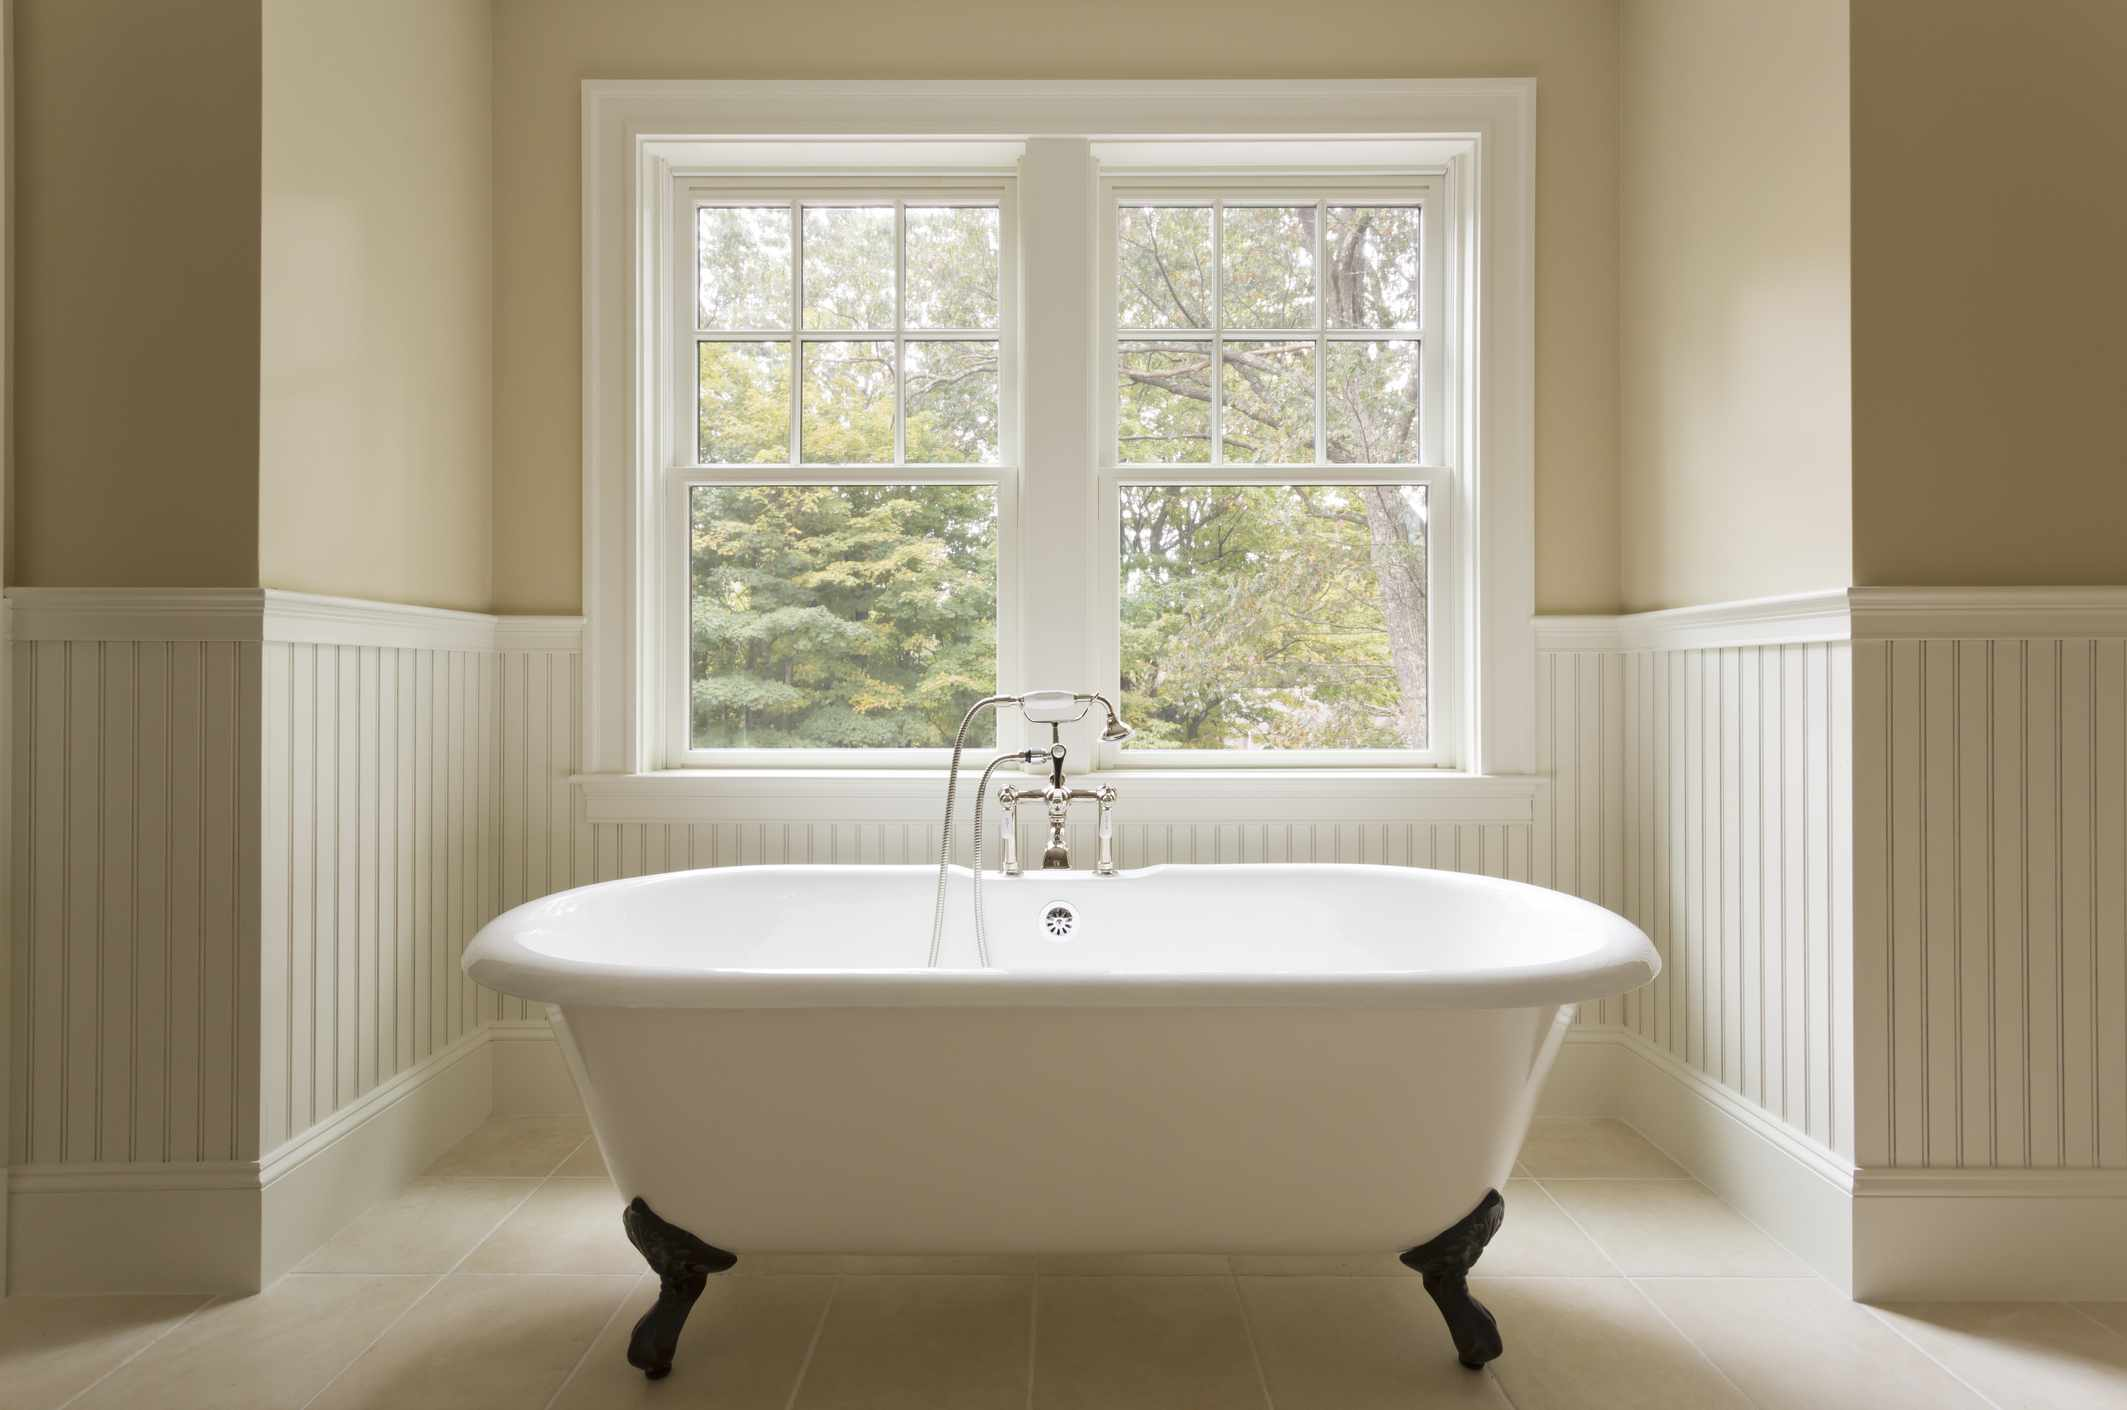 freestanding clawfoot tub